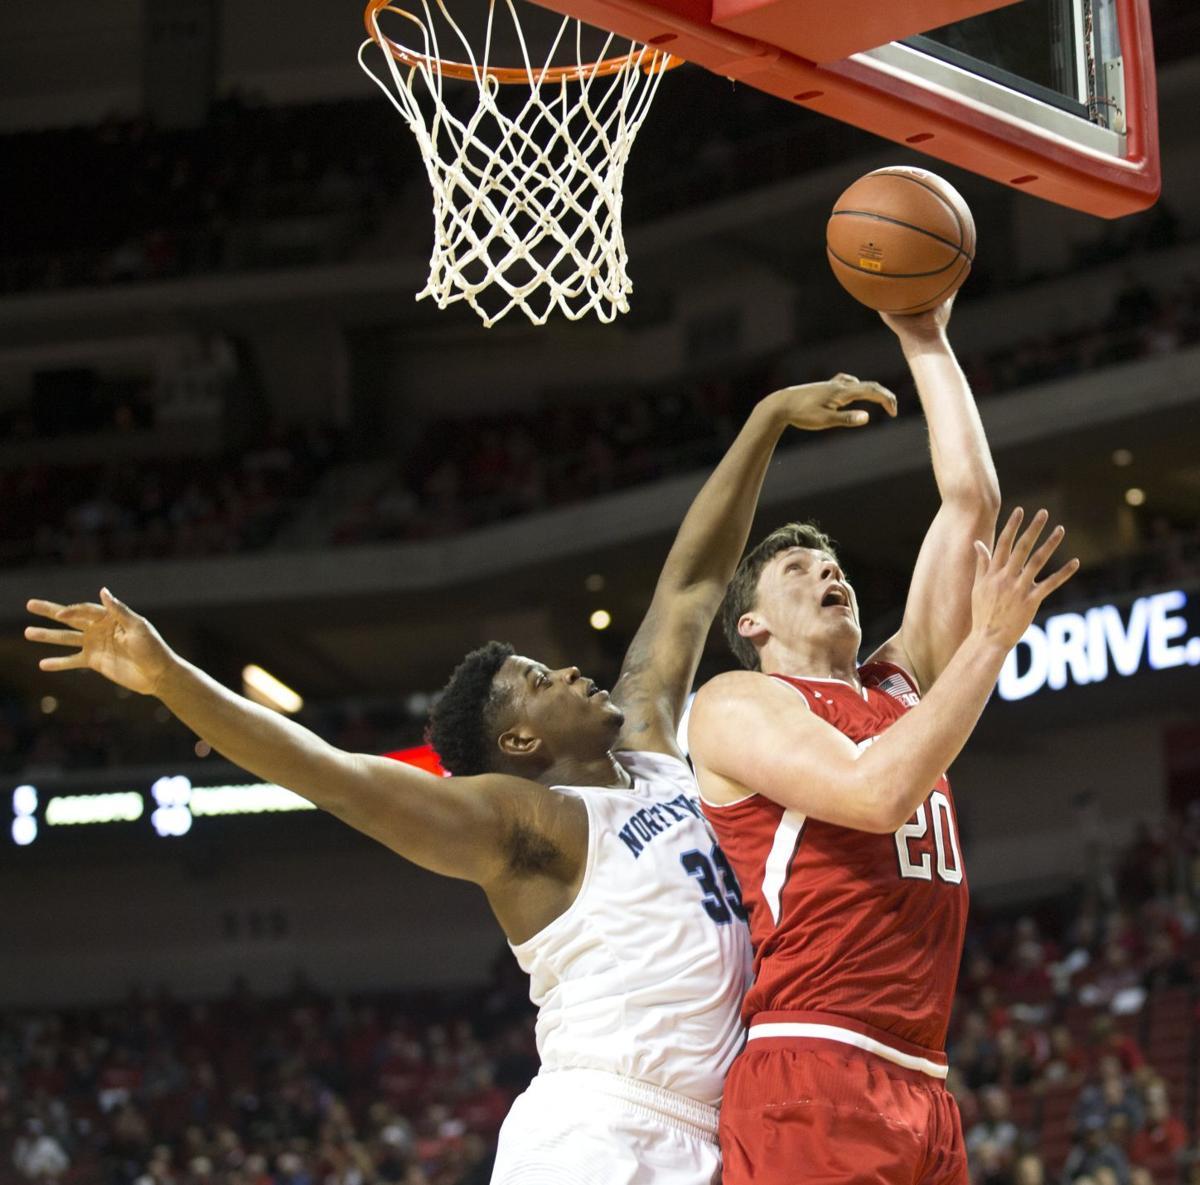 Photos: Nebraska basketball exhibition vs. Northwood | Men ...